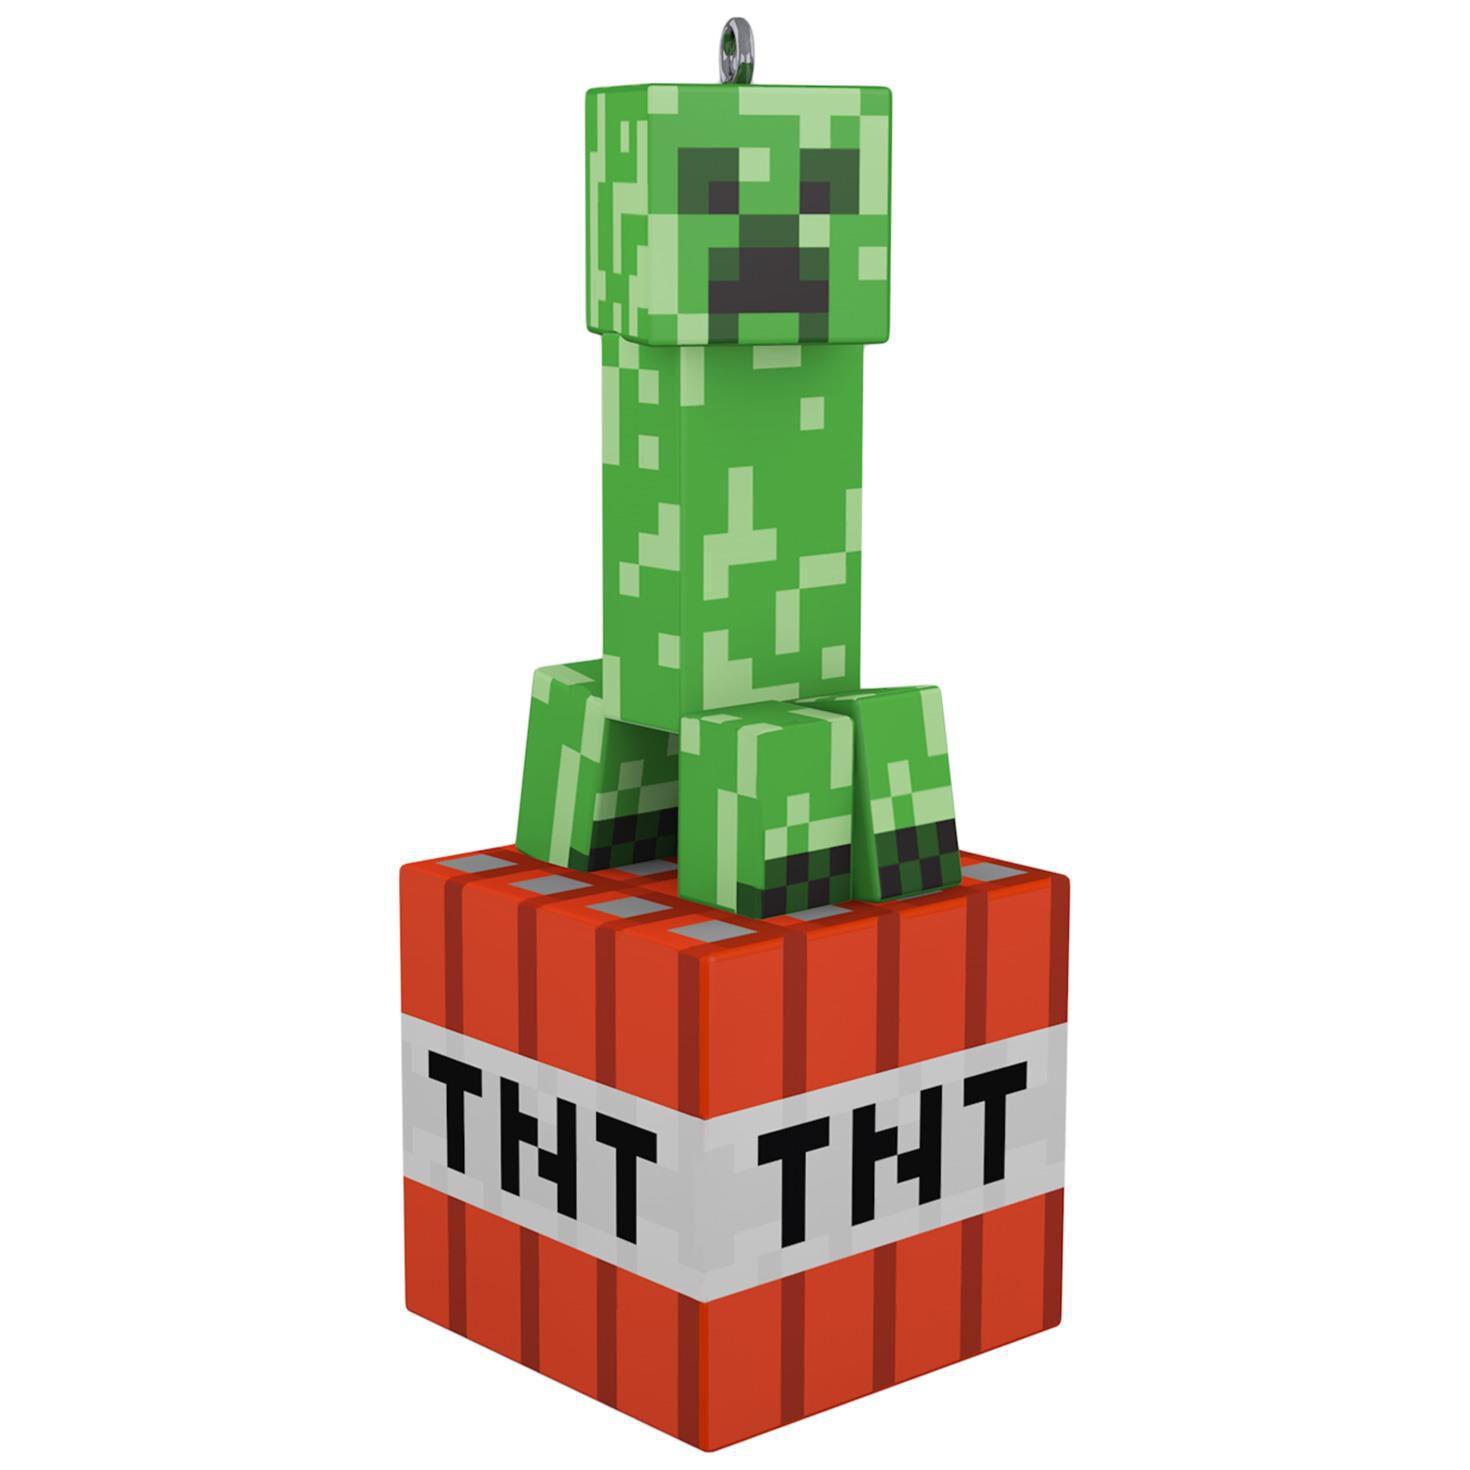 Minecraft Creeper Ornament Keepsake Ornaments Hallmark